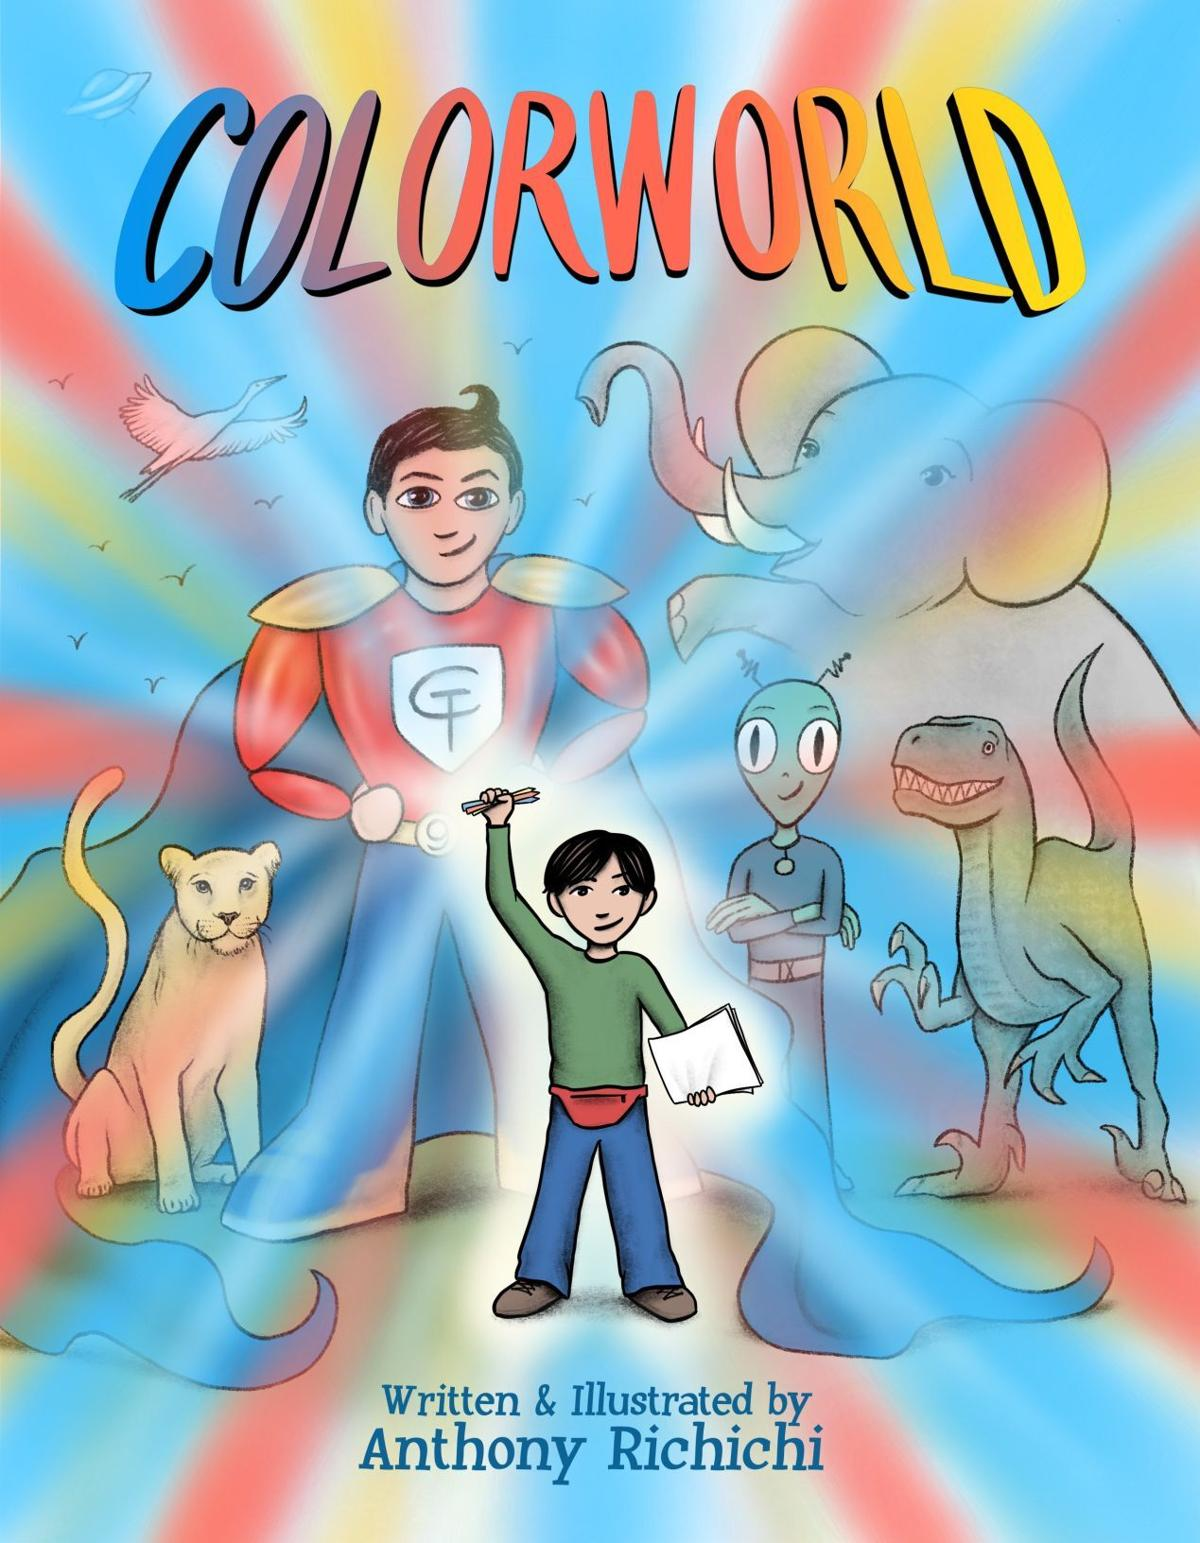 'Colorworld'